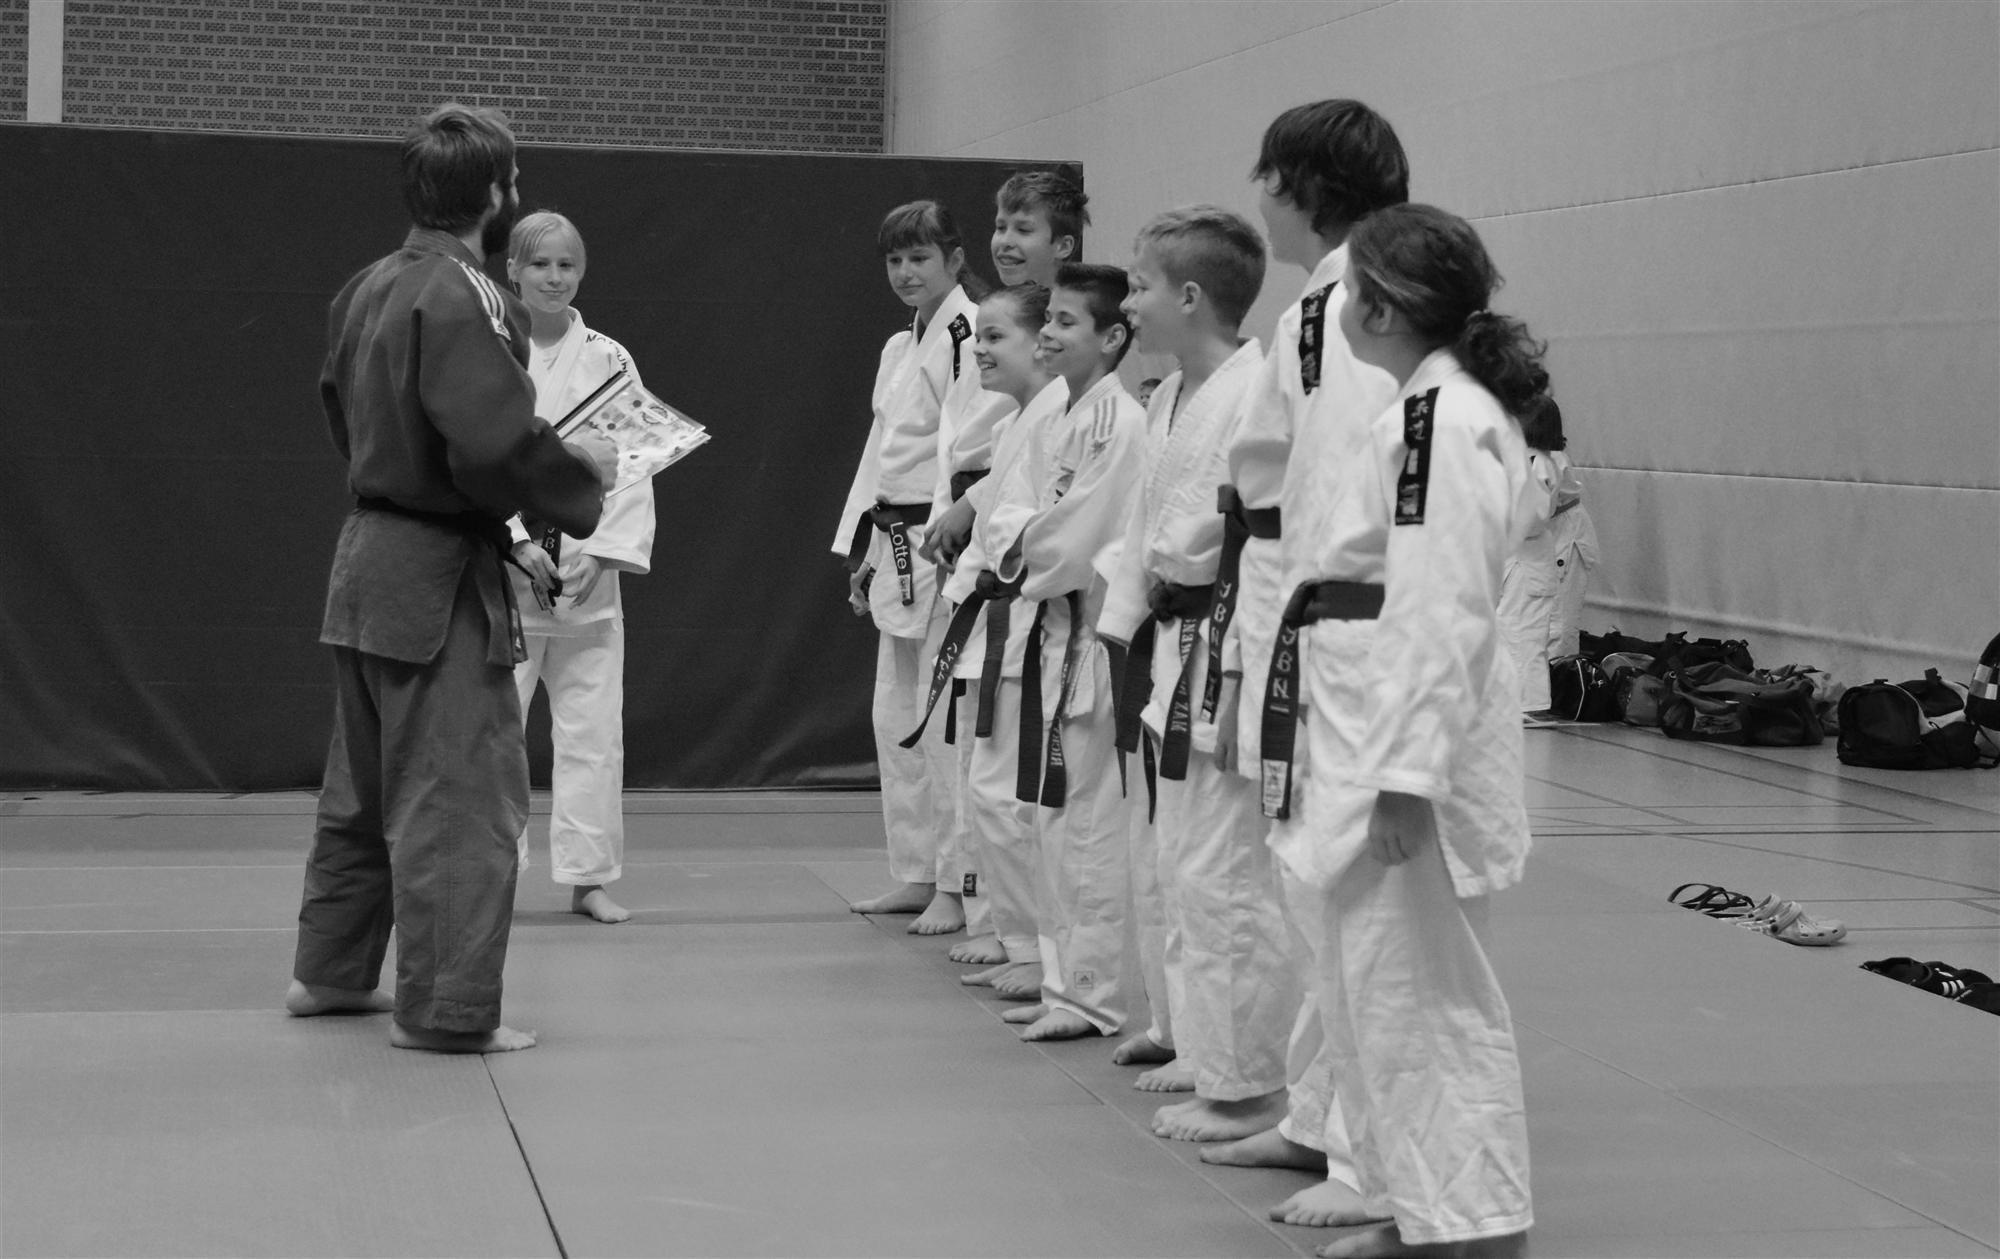 http://judoclubbrunssum.nl/iw-courses/m3/